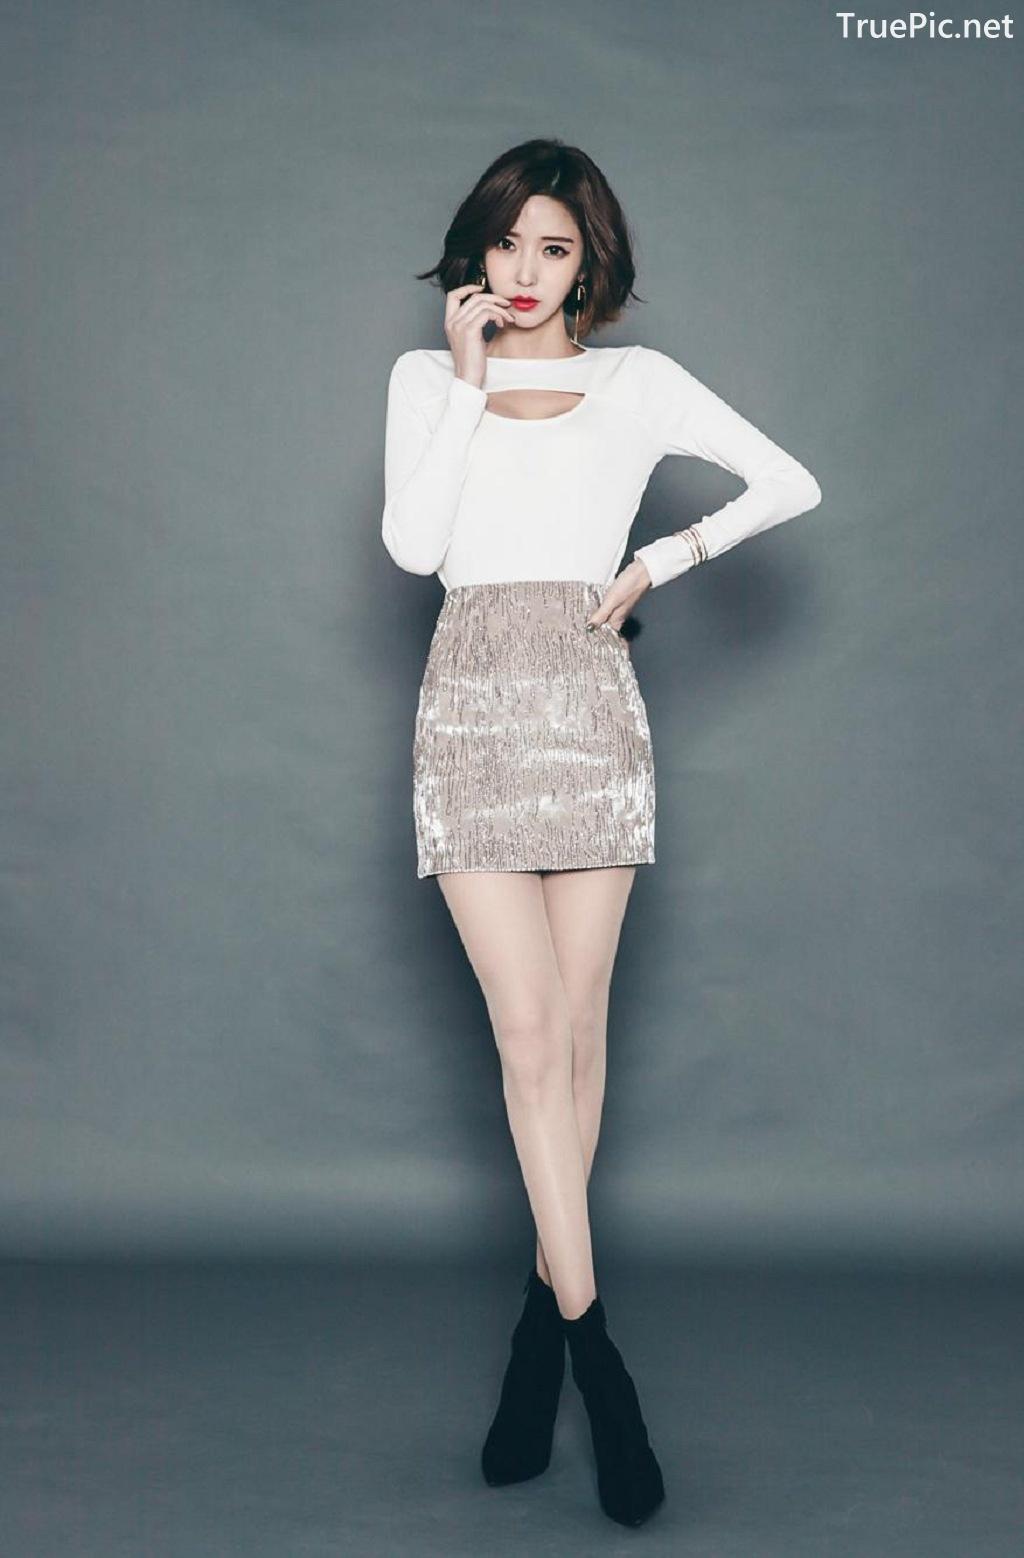 Image Ye Jin - Korean Fashion Model - Studio Photoshoot Collection - TruePic.net - Picture-2